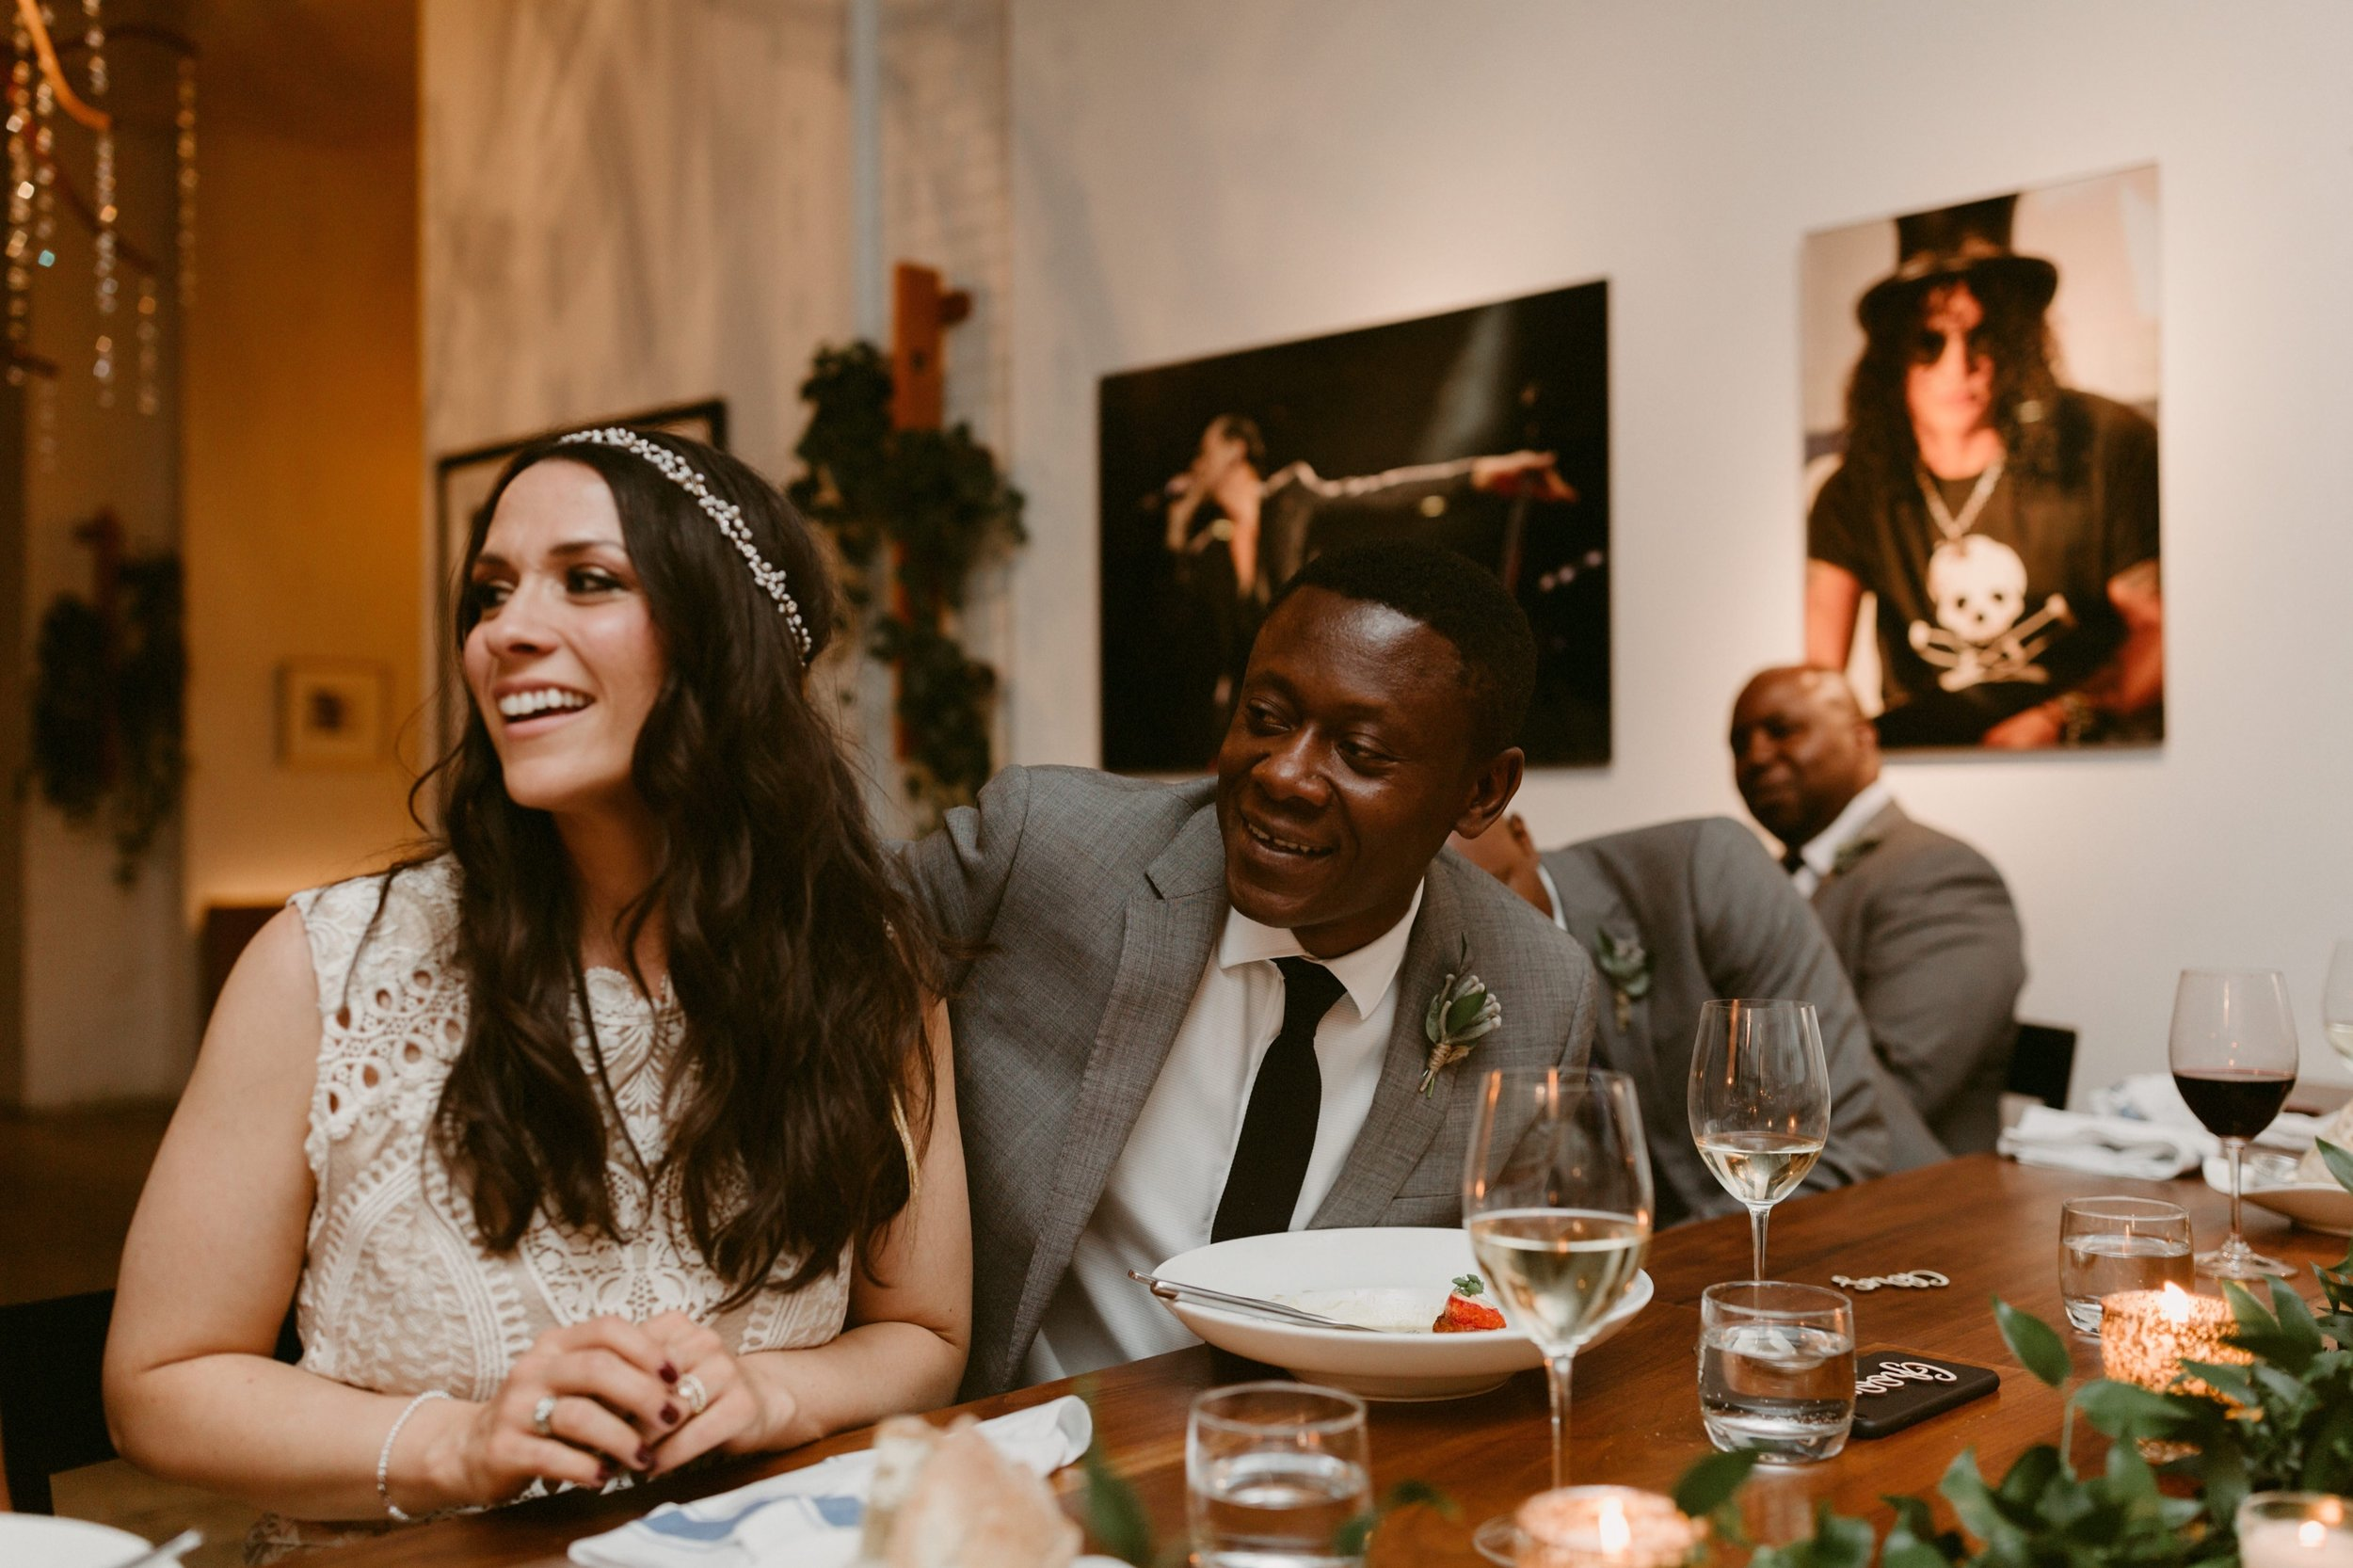 086_Spadina House Wedding (548 of 748)_intimate_Boehmer_Restaurant_Toronto_Wedding.jpg